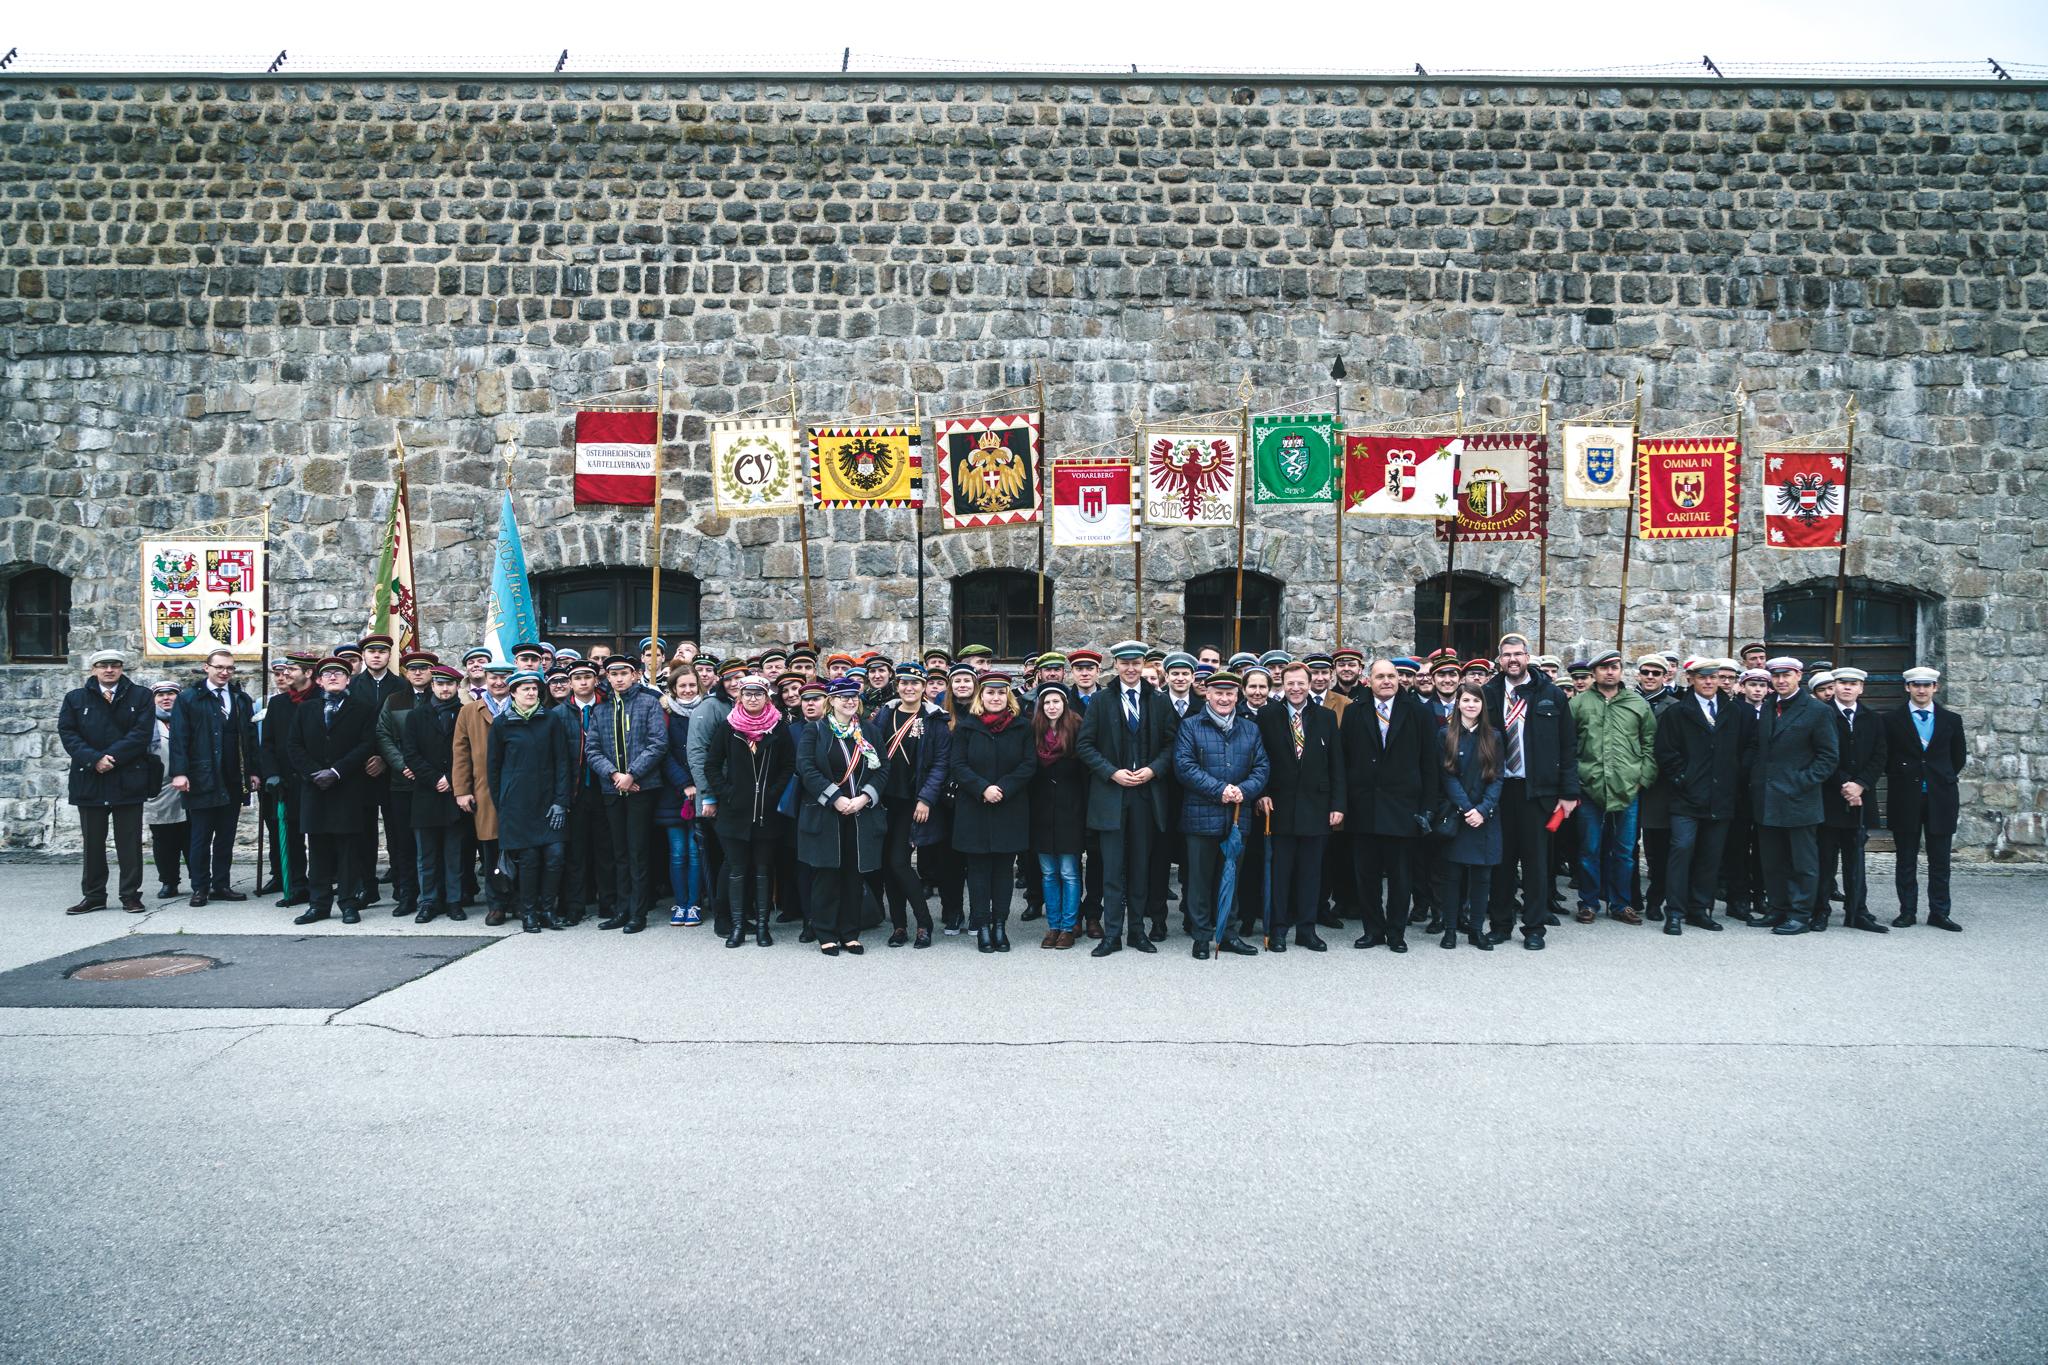 20190505-133716-_SD_5058-MKV-Befreiungsfeier_Mauthausen.jpg